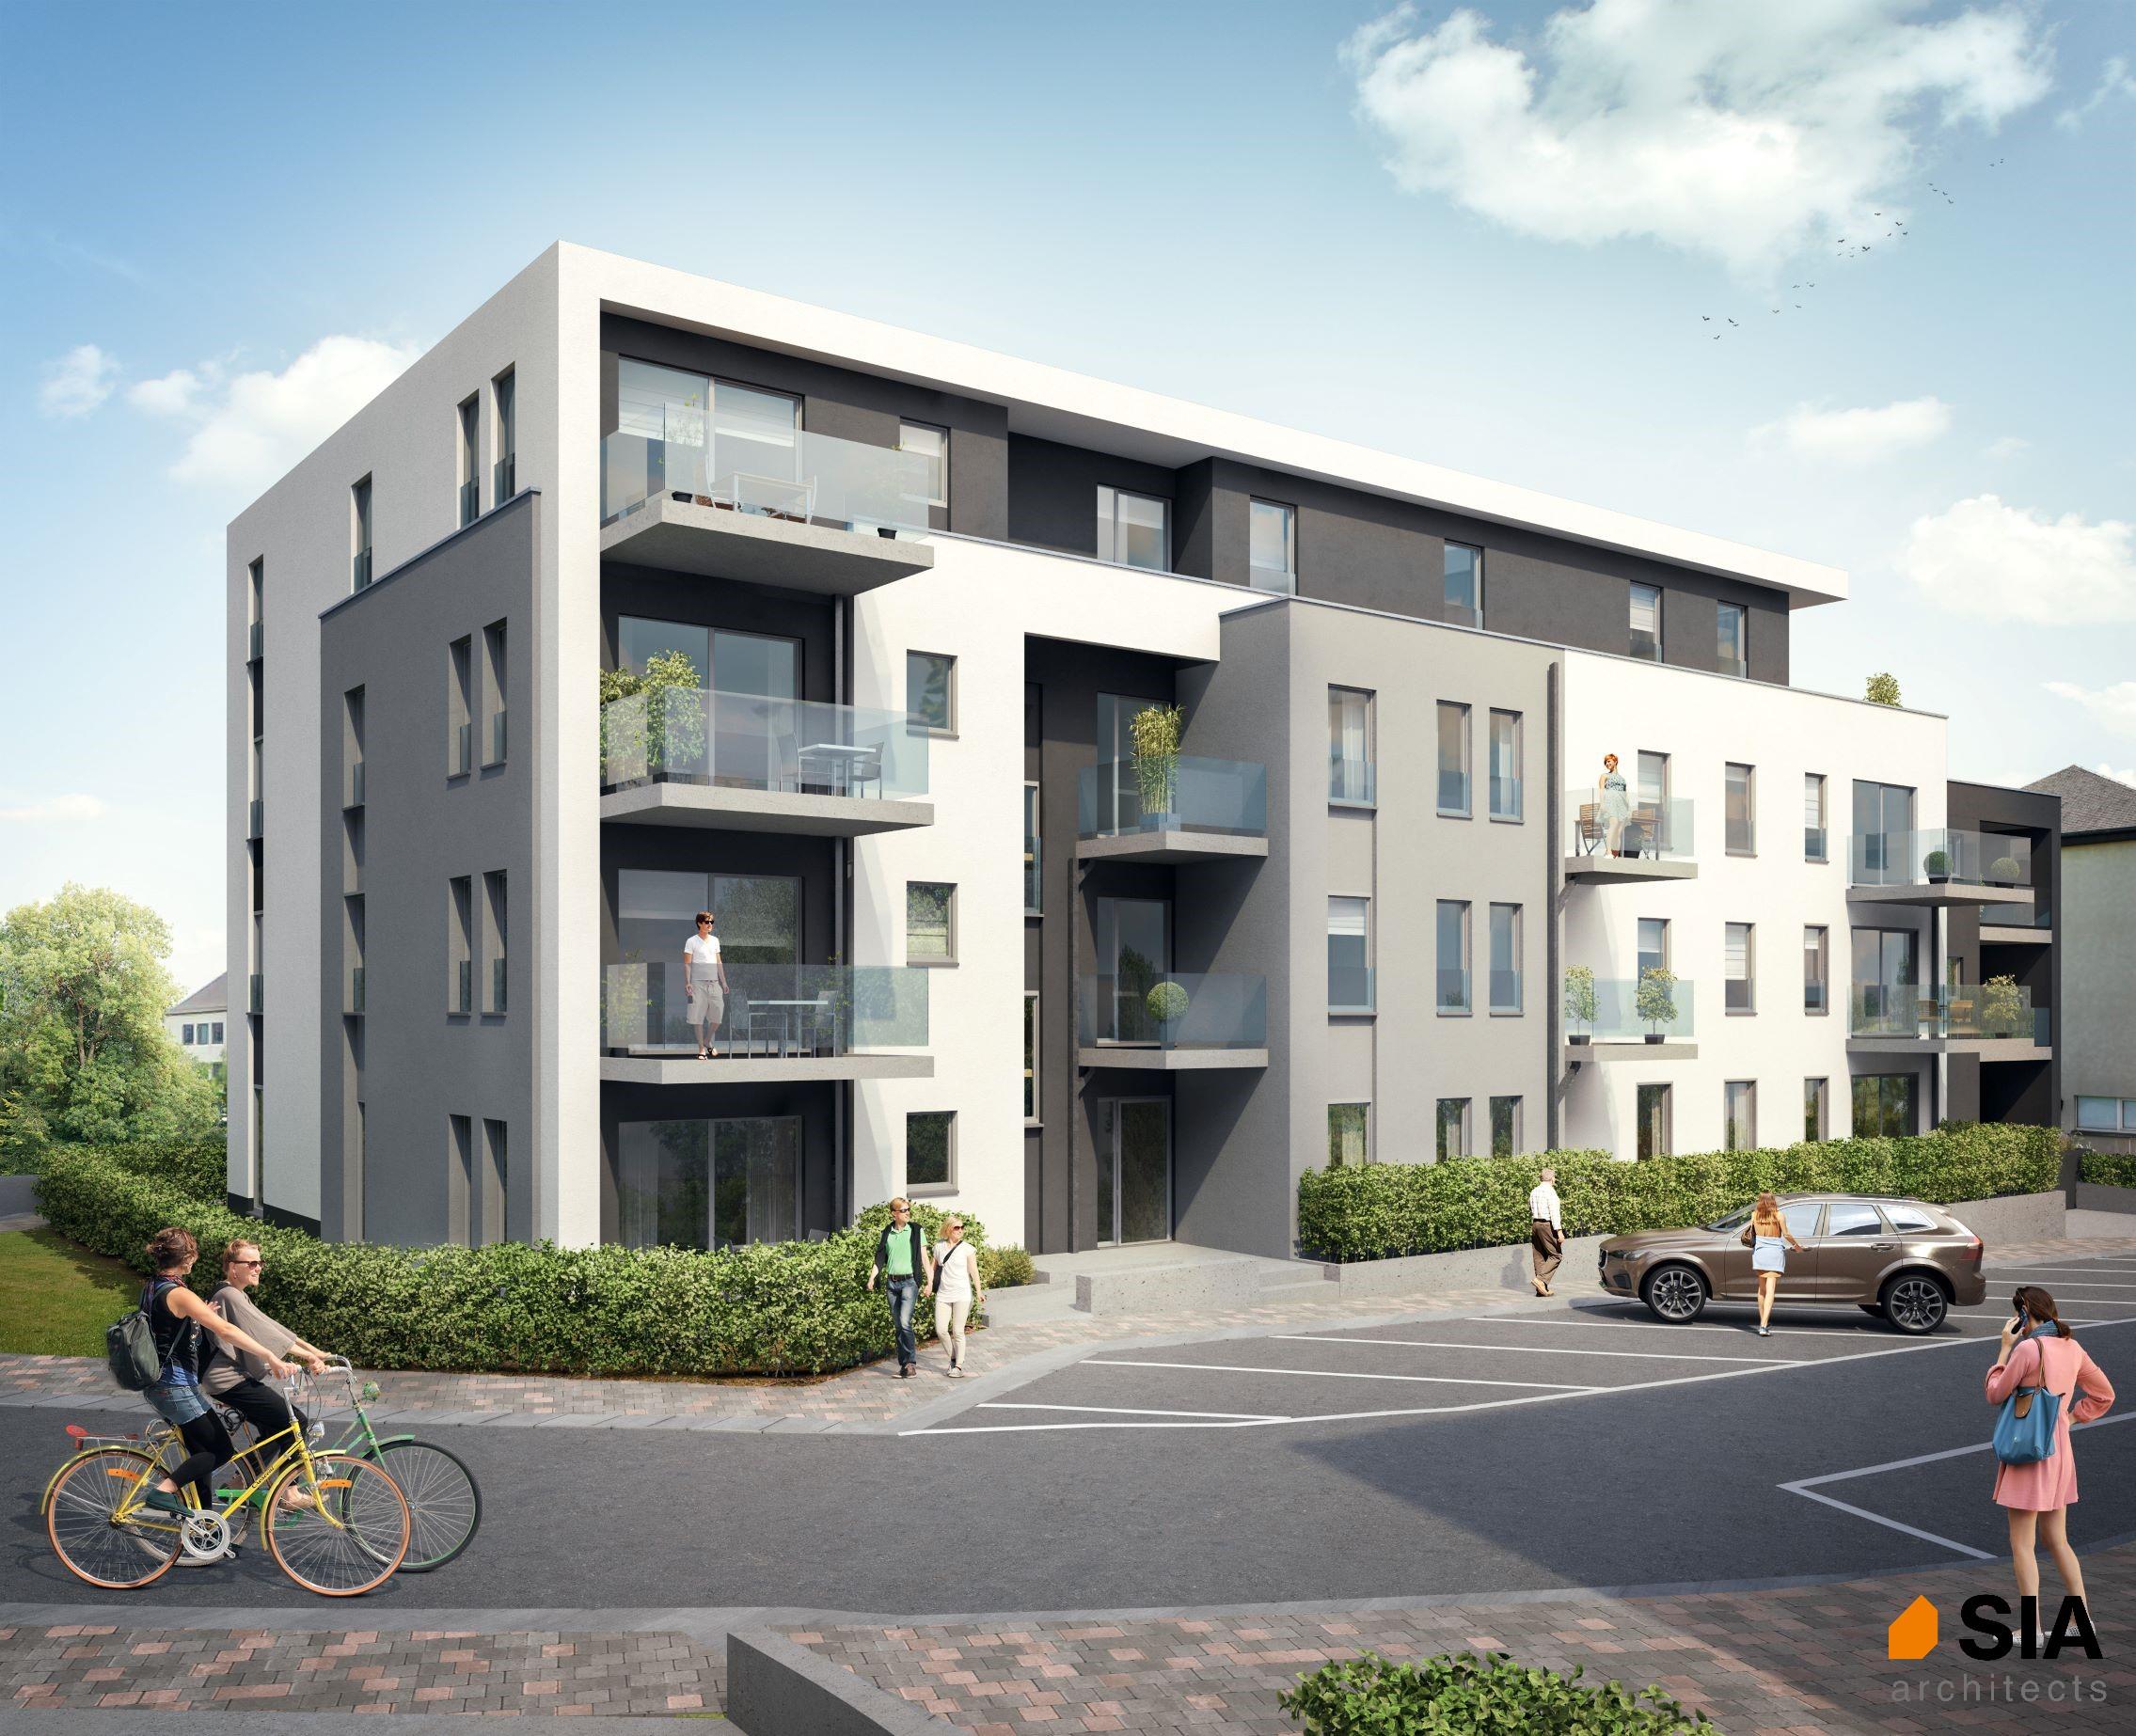 https://sia-arch.eu/wp-content/uploads/2021/10/Libramont-Immeuble-Vicinal-vue-2-Gofontaine.jpg